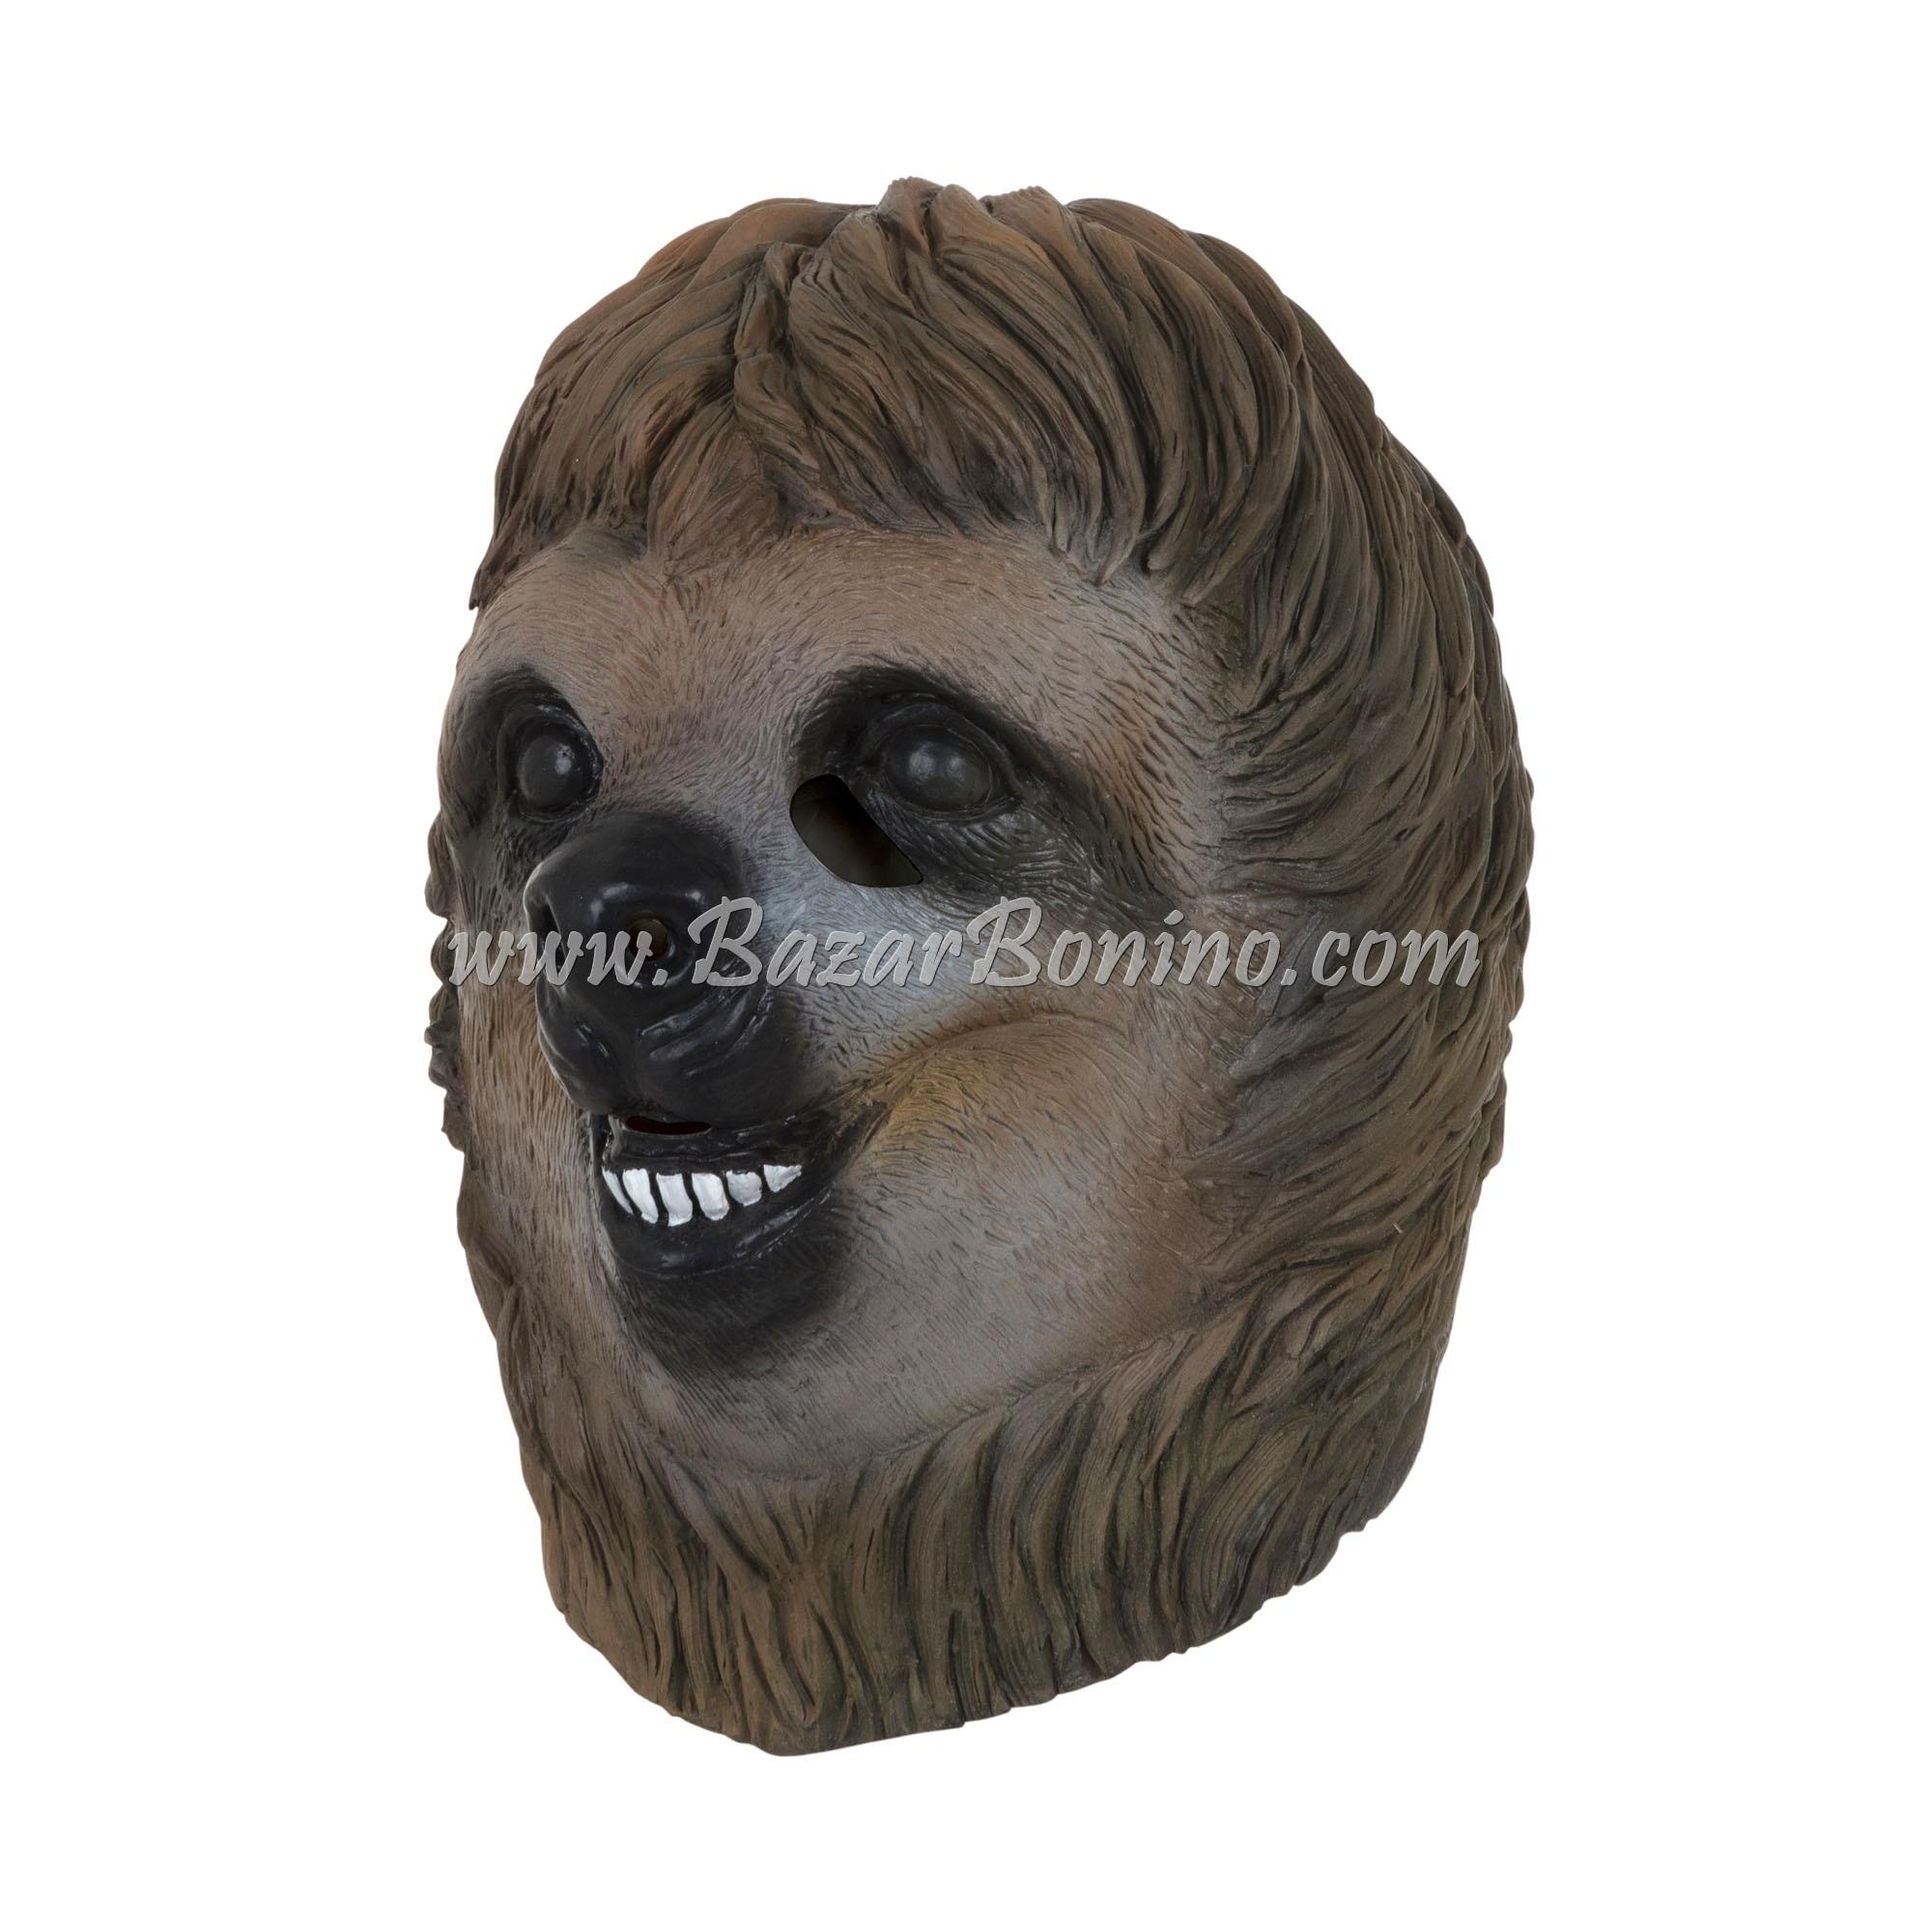 BM0534 - Maschera Bradipo Lattice